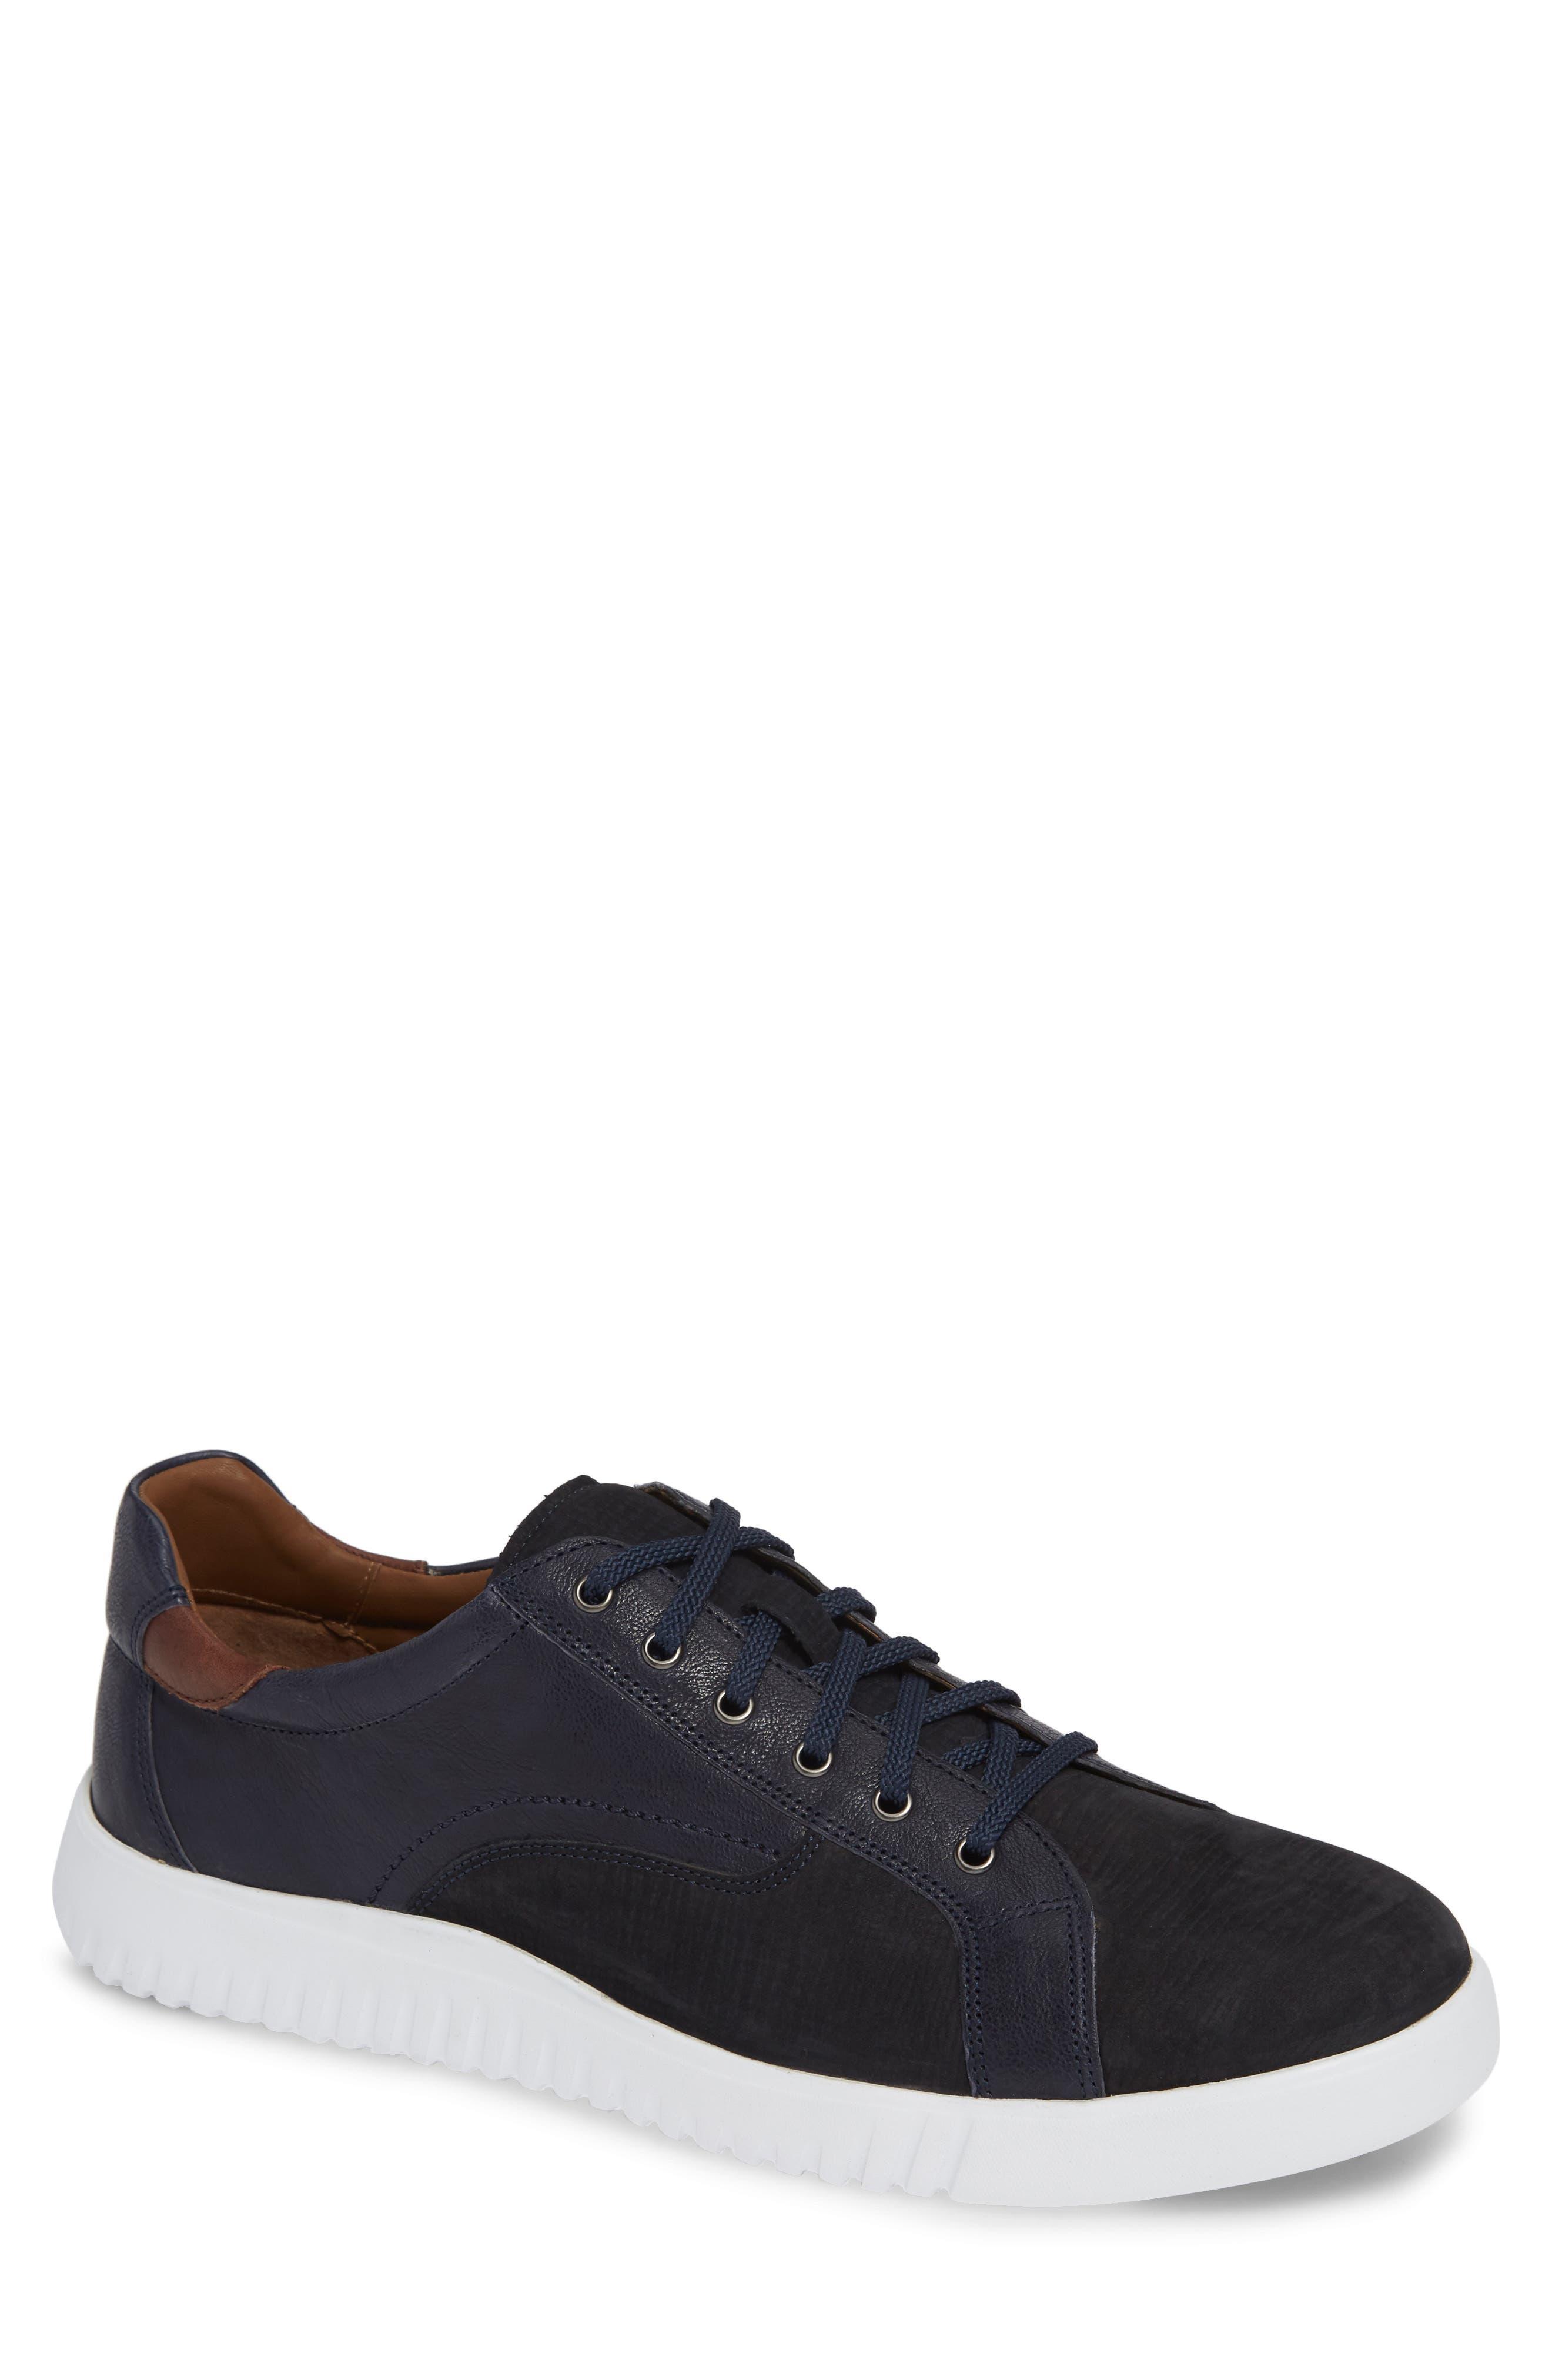 Johnston & Murphy Mcfarland Sneaker, Blue